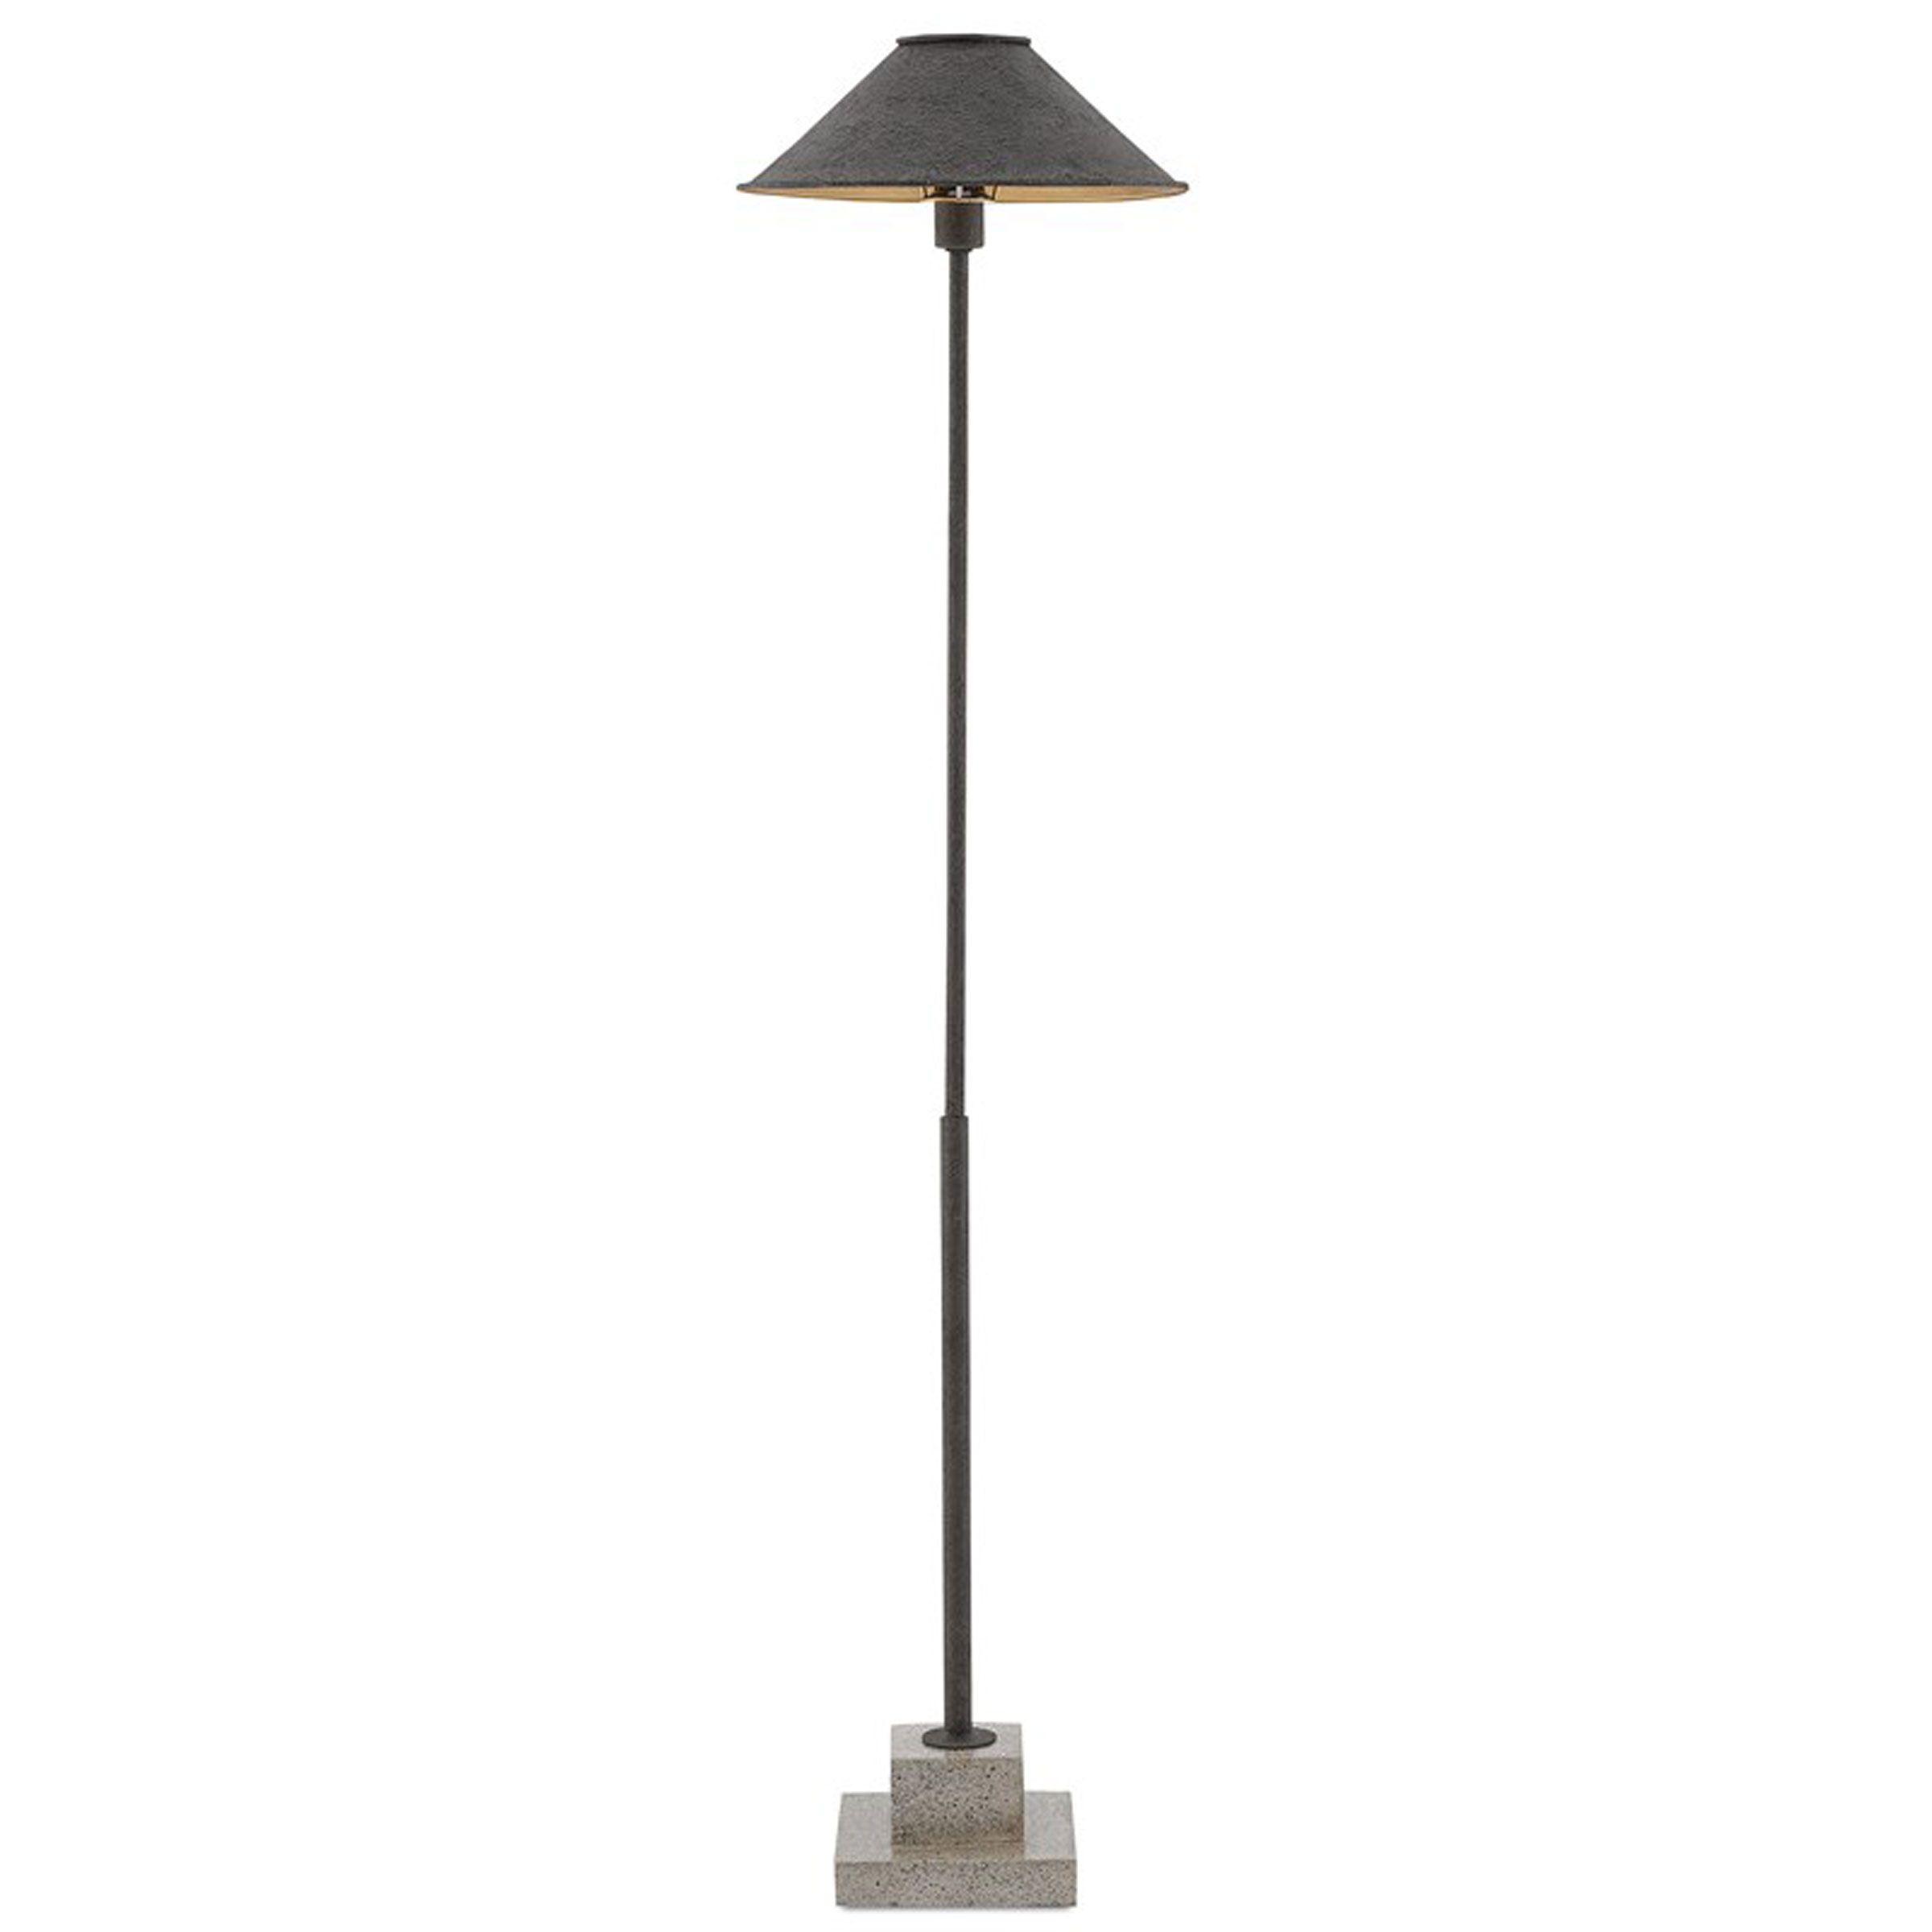 Liela Modern Classic Black Wrought Iron Concrete Base Floor Lamp In 2021 Floor Lamp Black Shade Black Floor Lamp Floor Lamp